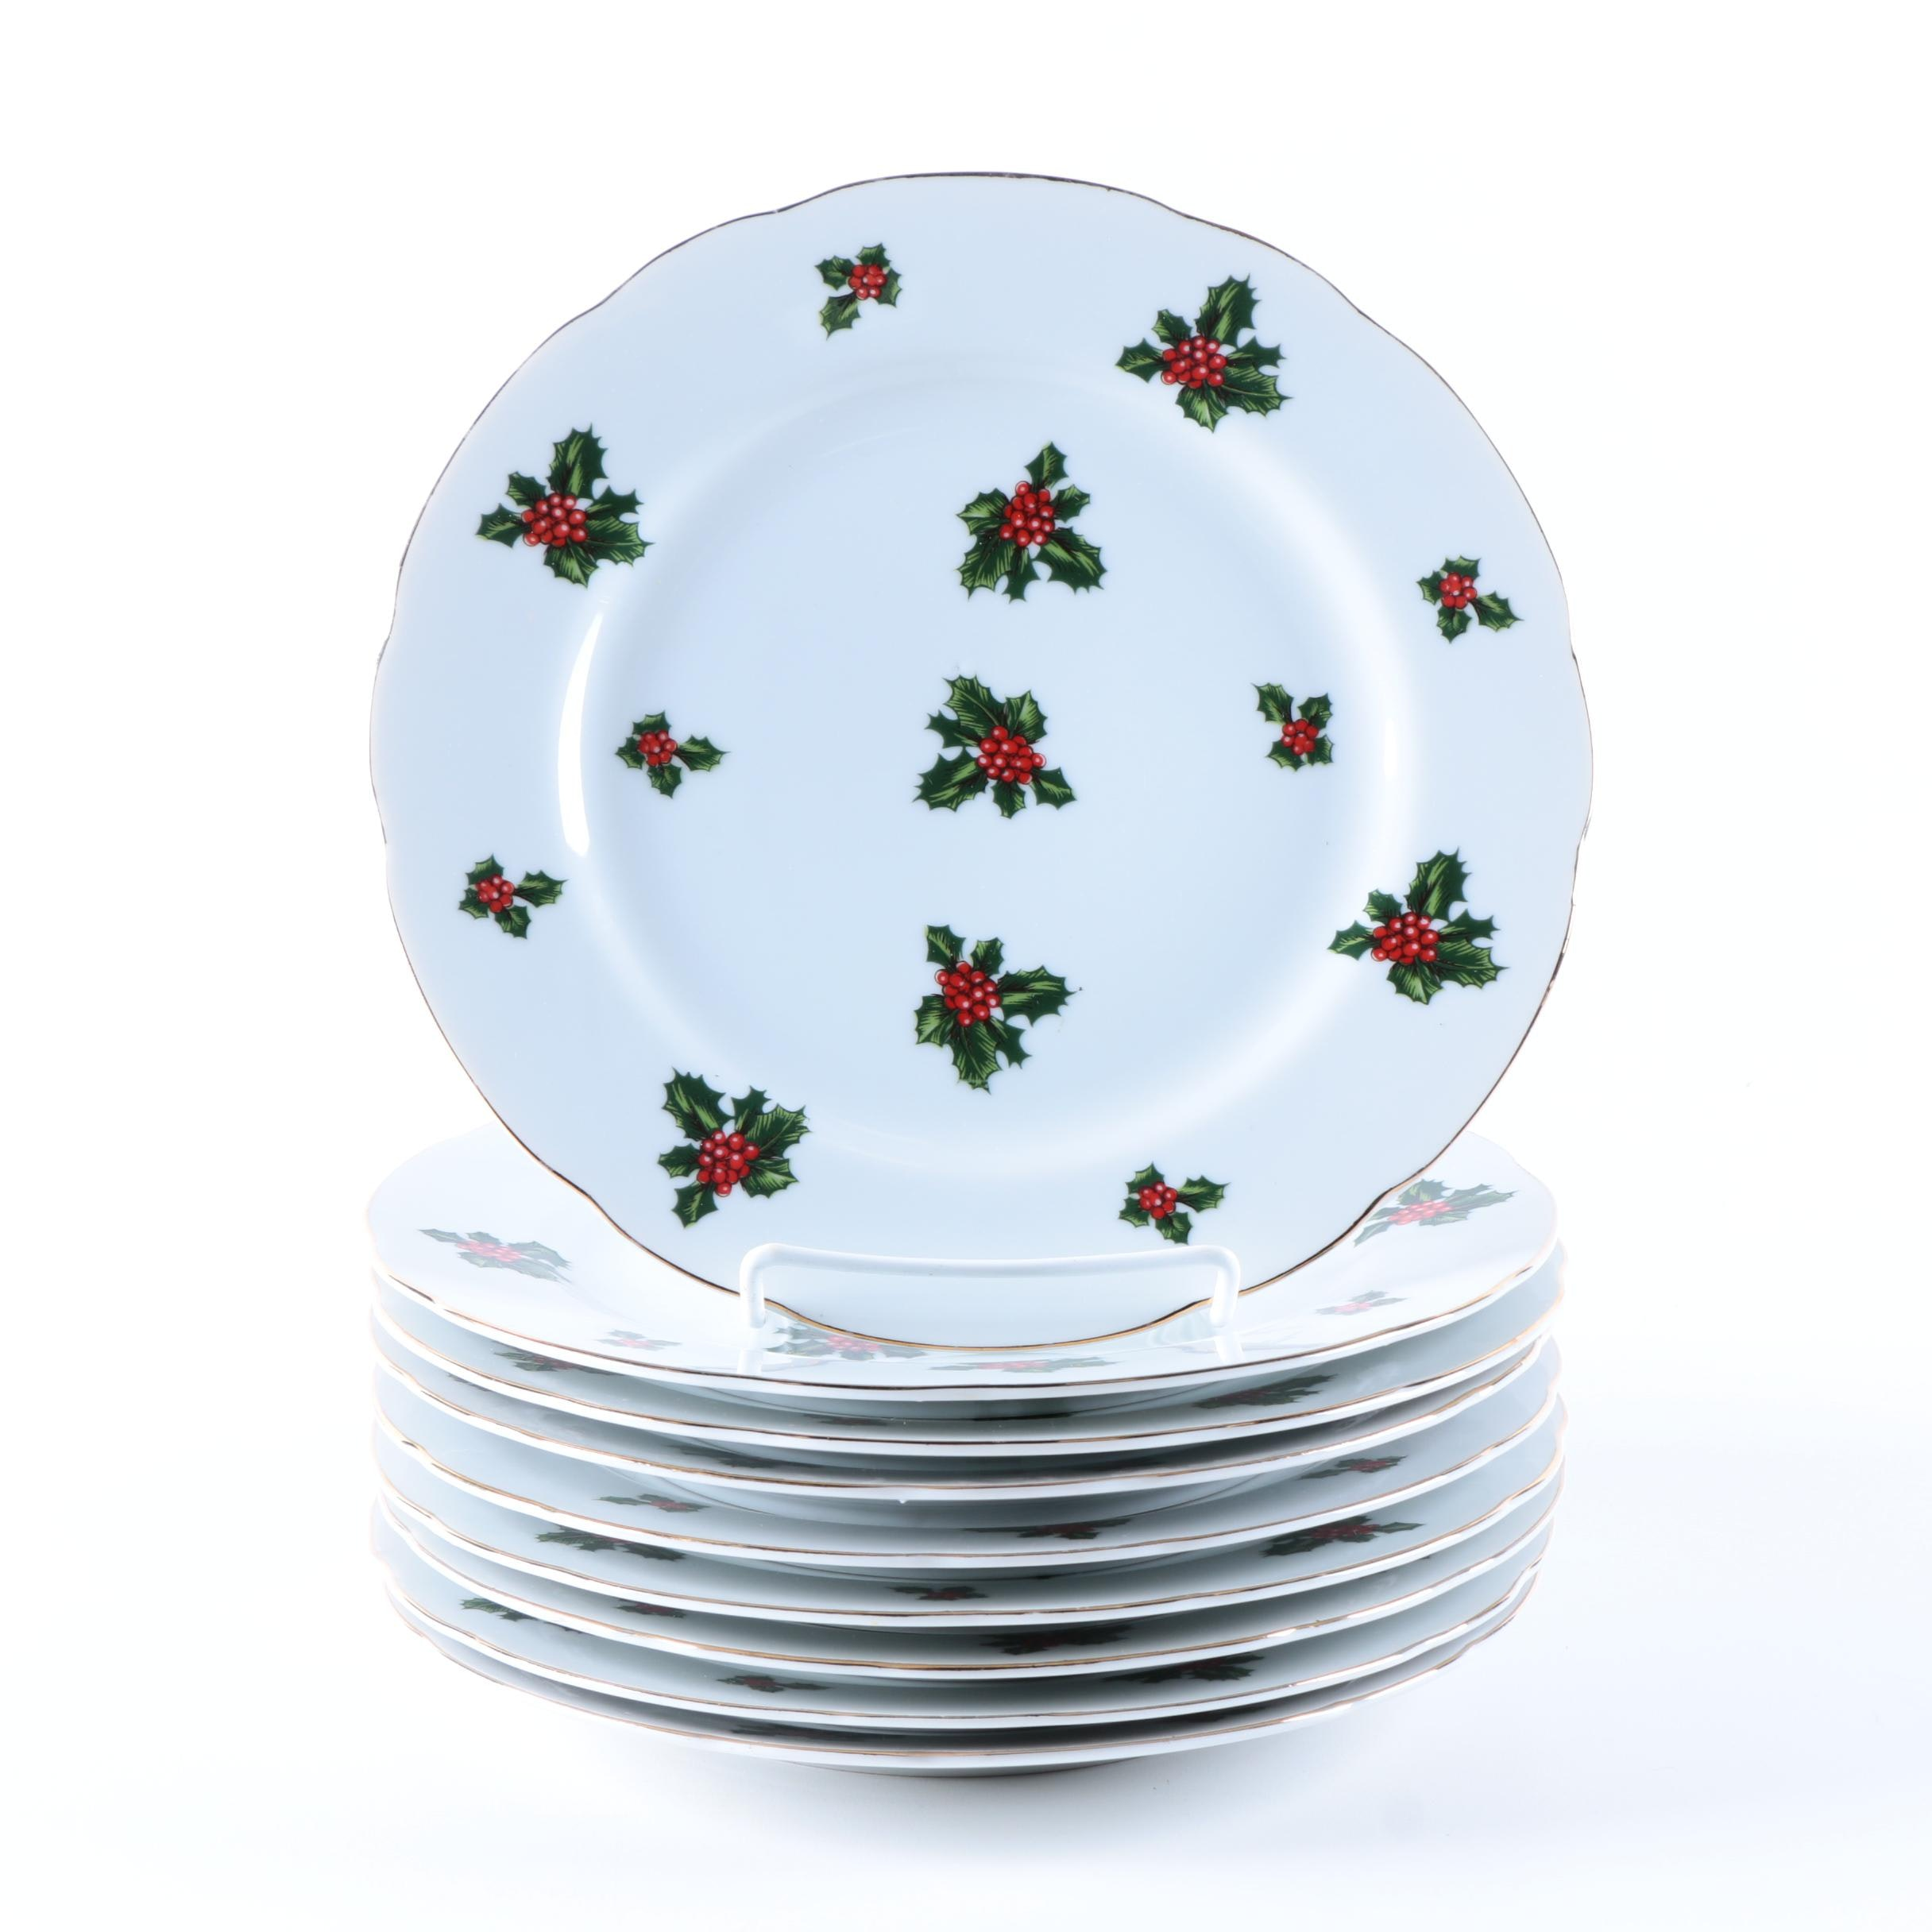 Leftone China Hand Painted Holiday Plates